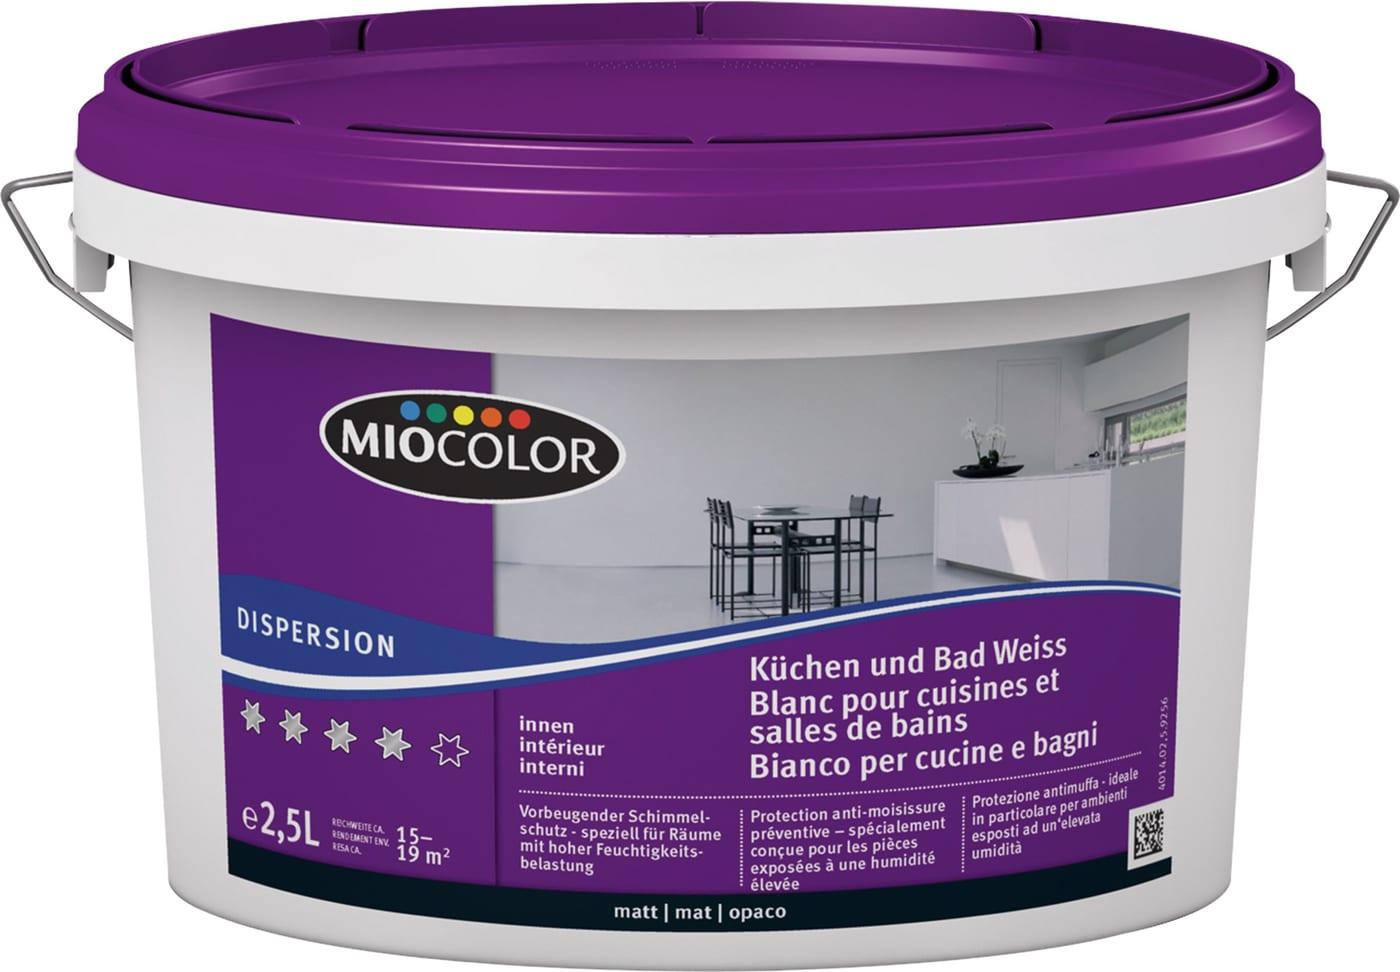 miocolor k chen und bad dispersion migros. Black Bedroom Furniture Sets. Home Design Ideas